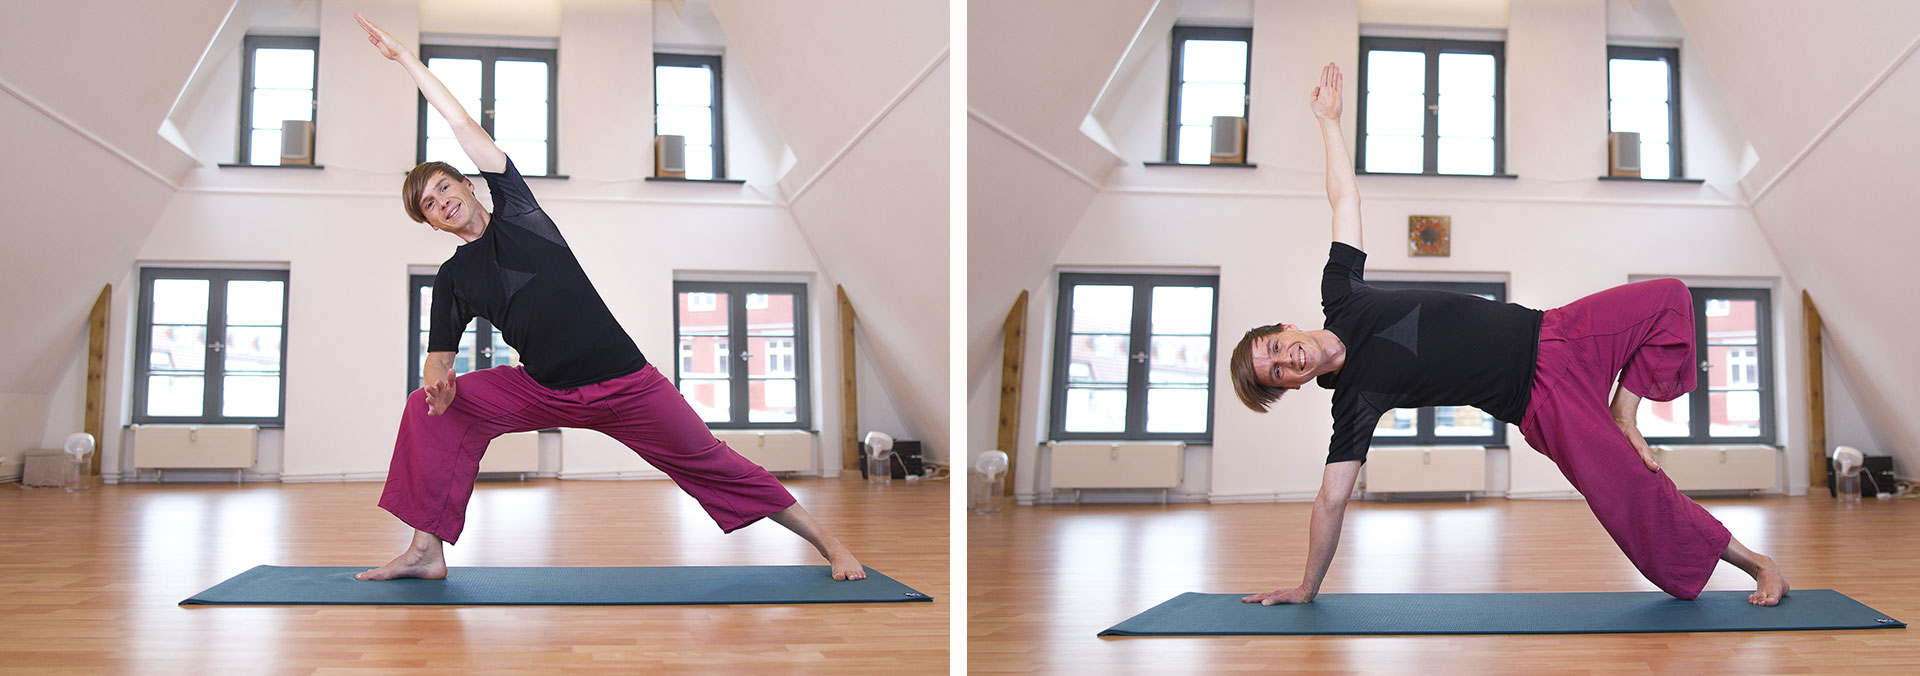 Hatha-Yoga Yogaschule Christian Bender in Rostock